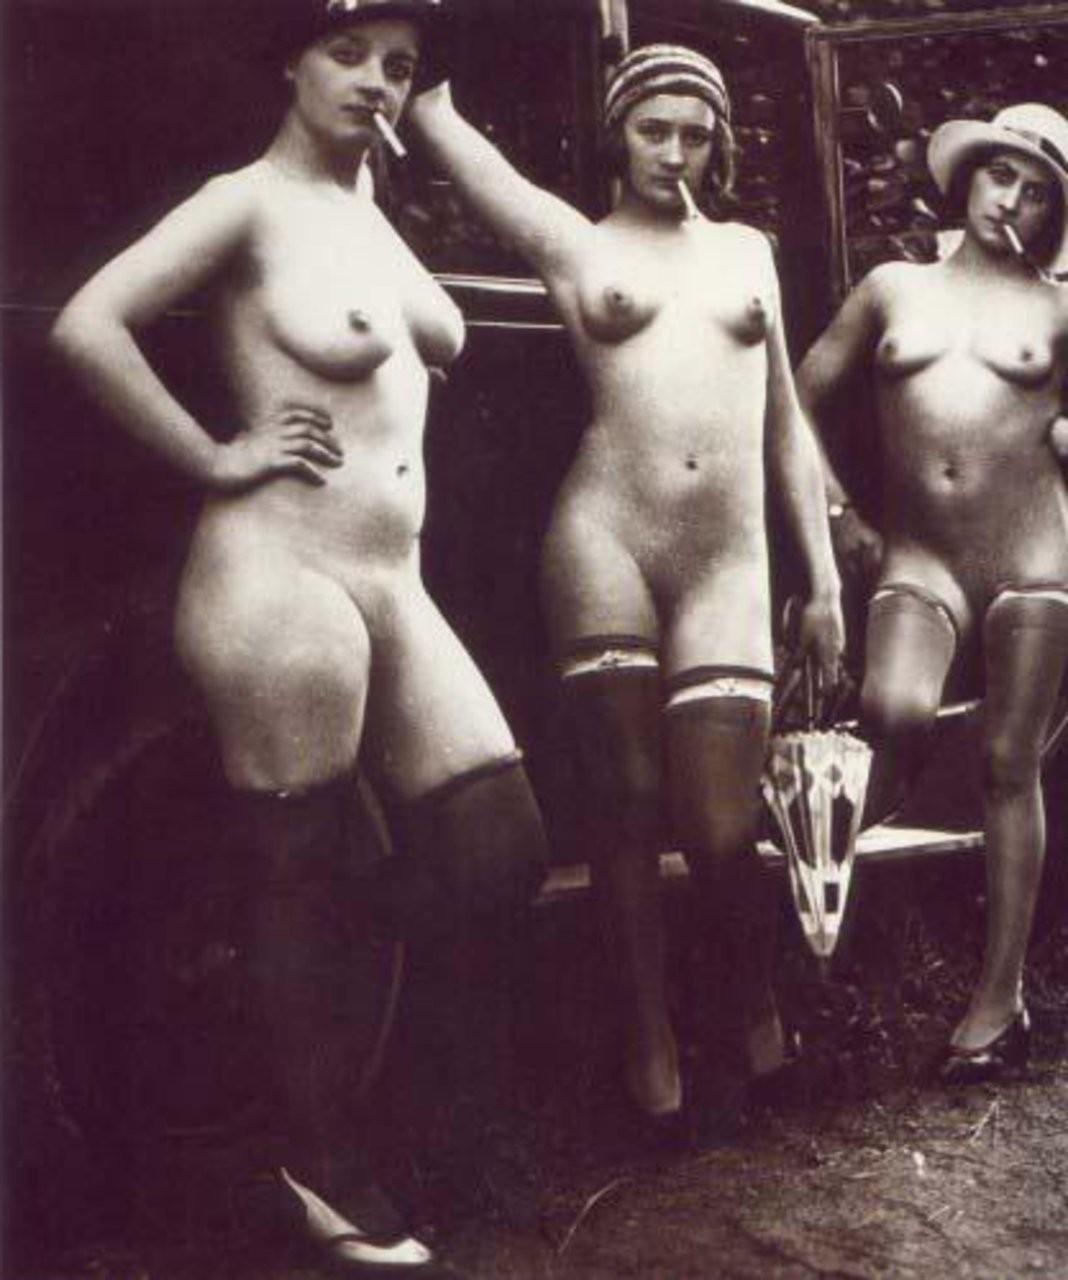 vintage lace briefs – Erotic